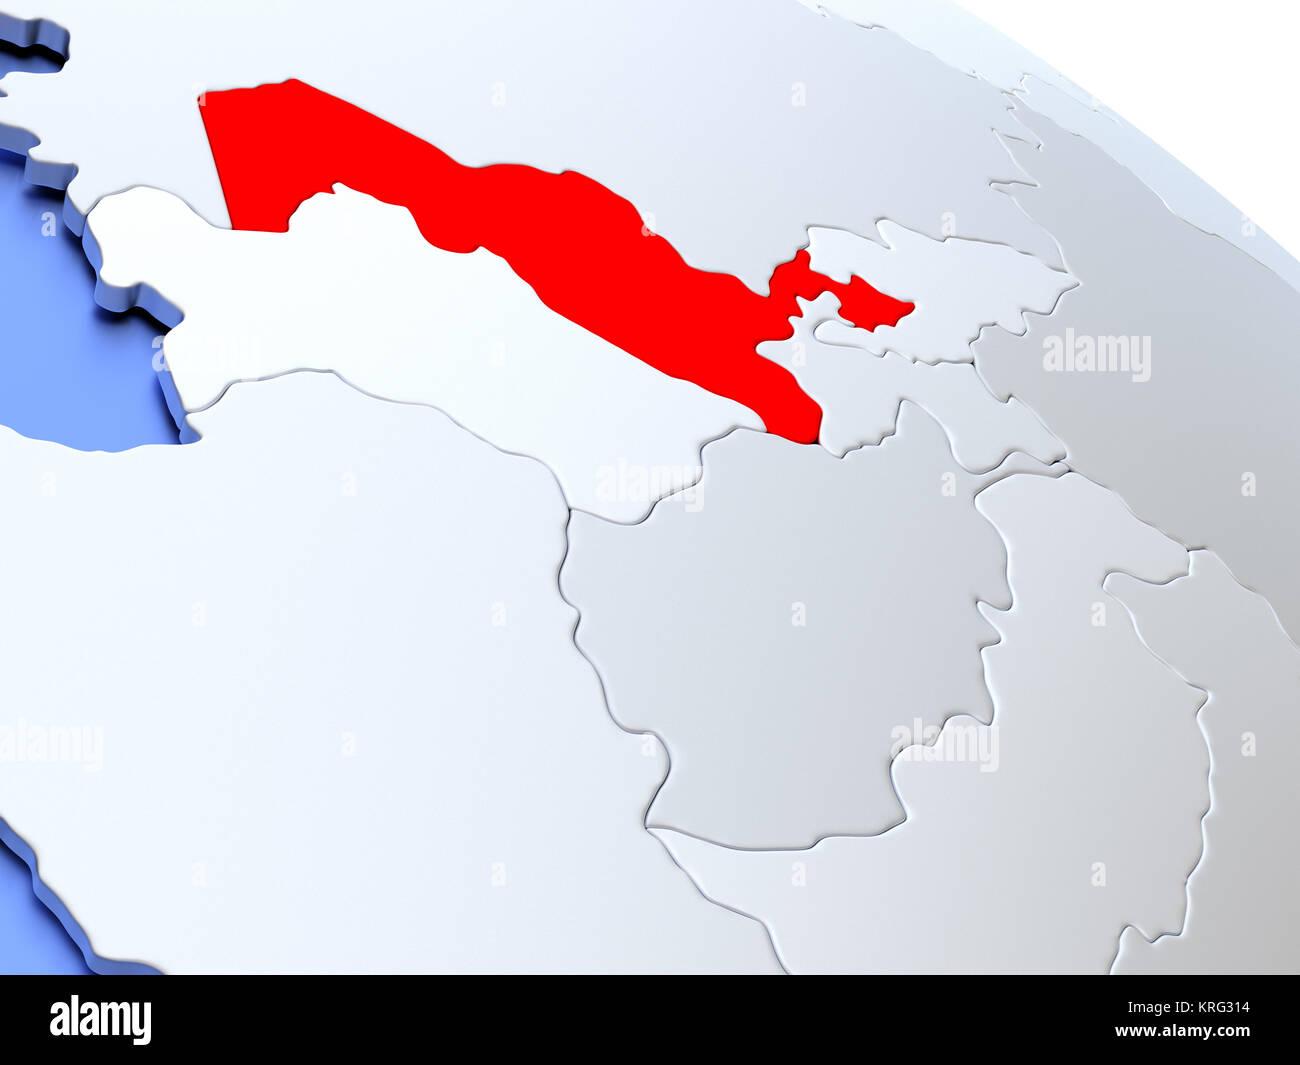 Uzbekistan on world map Stock Photo: 169384016 - Alamy